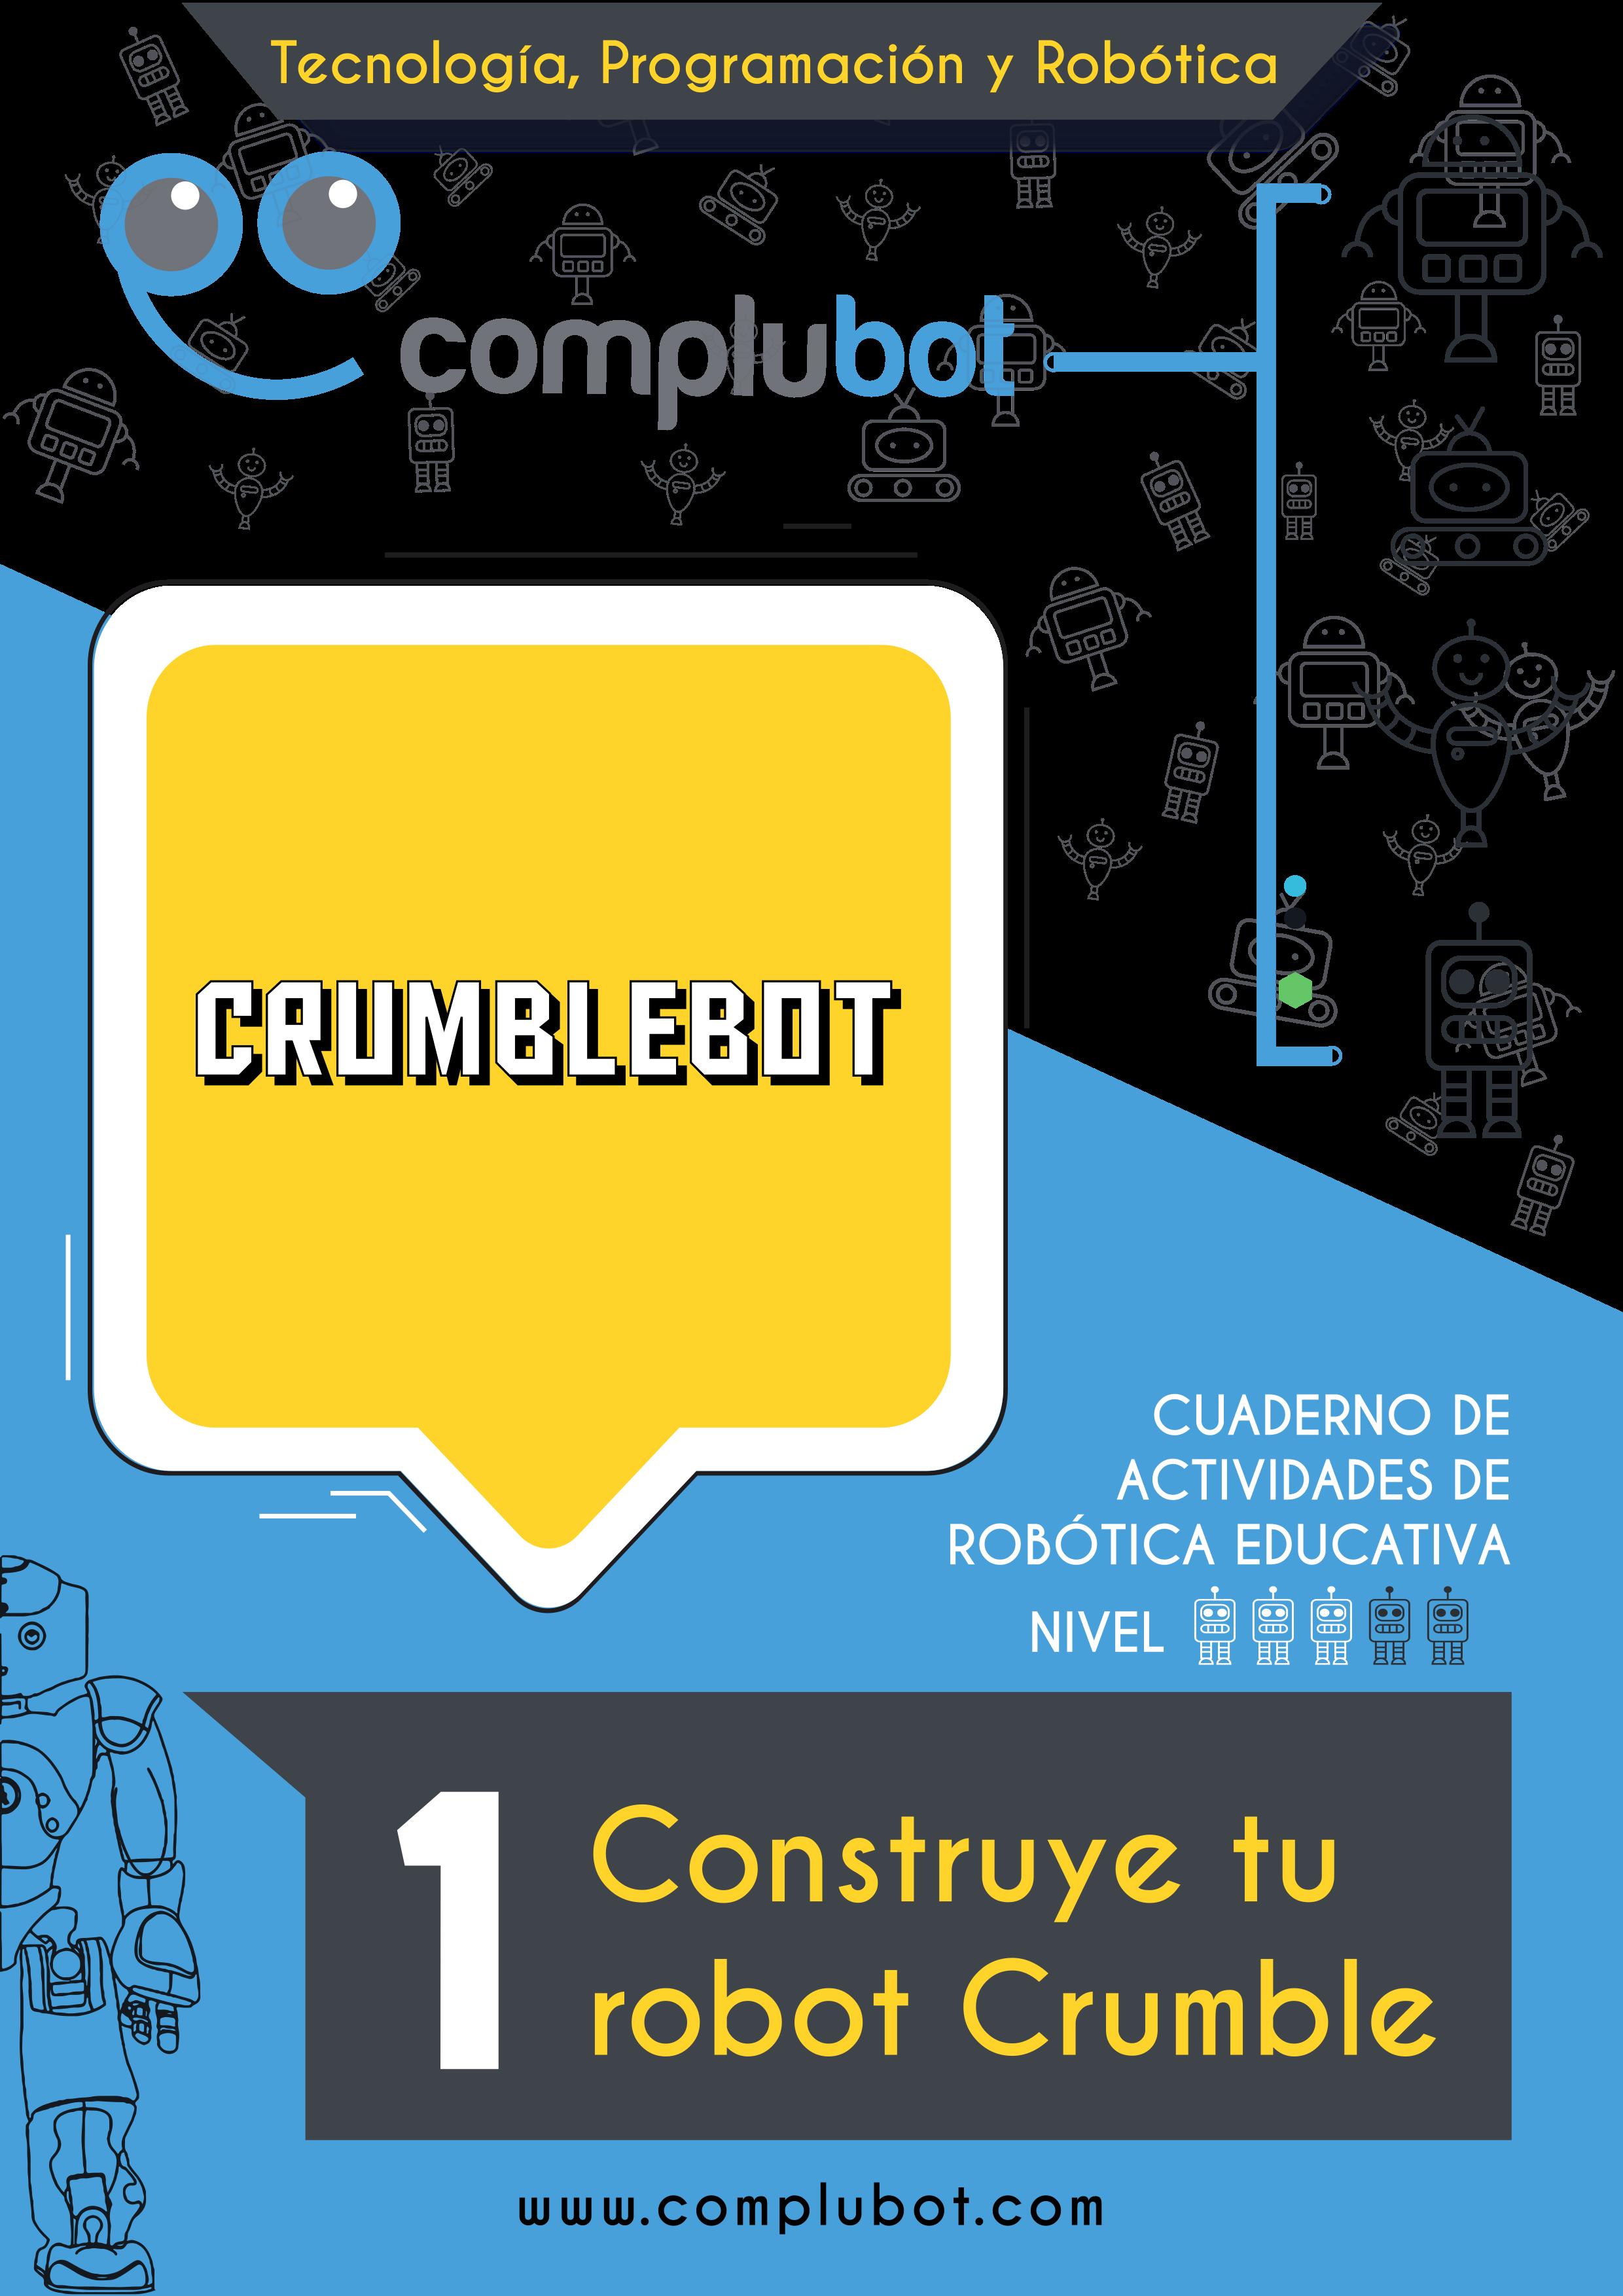 cdare_crumblebot1